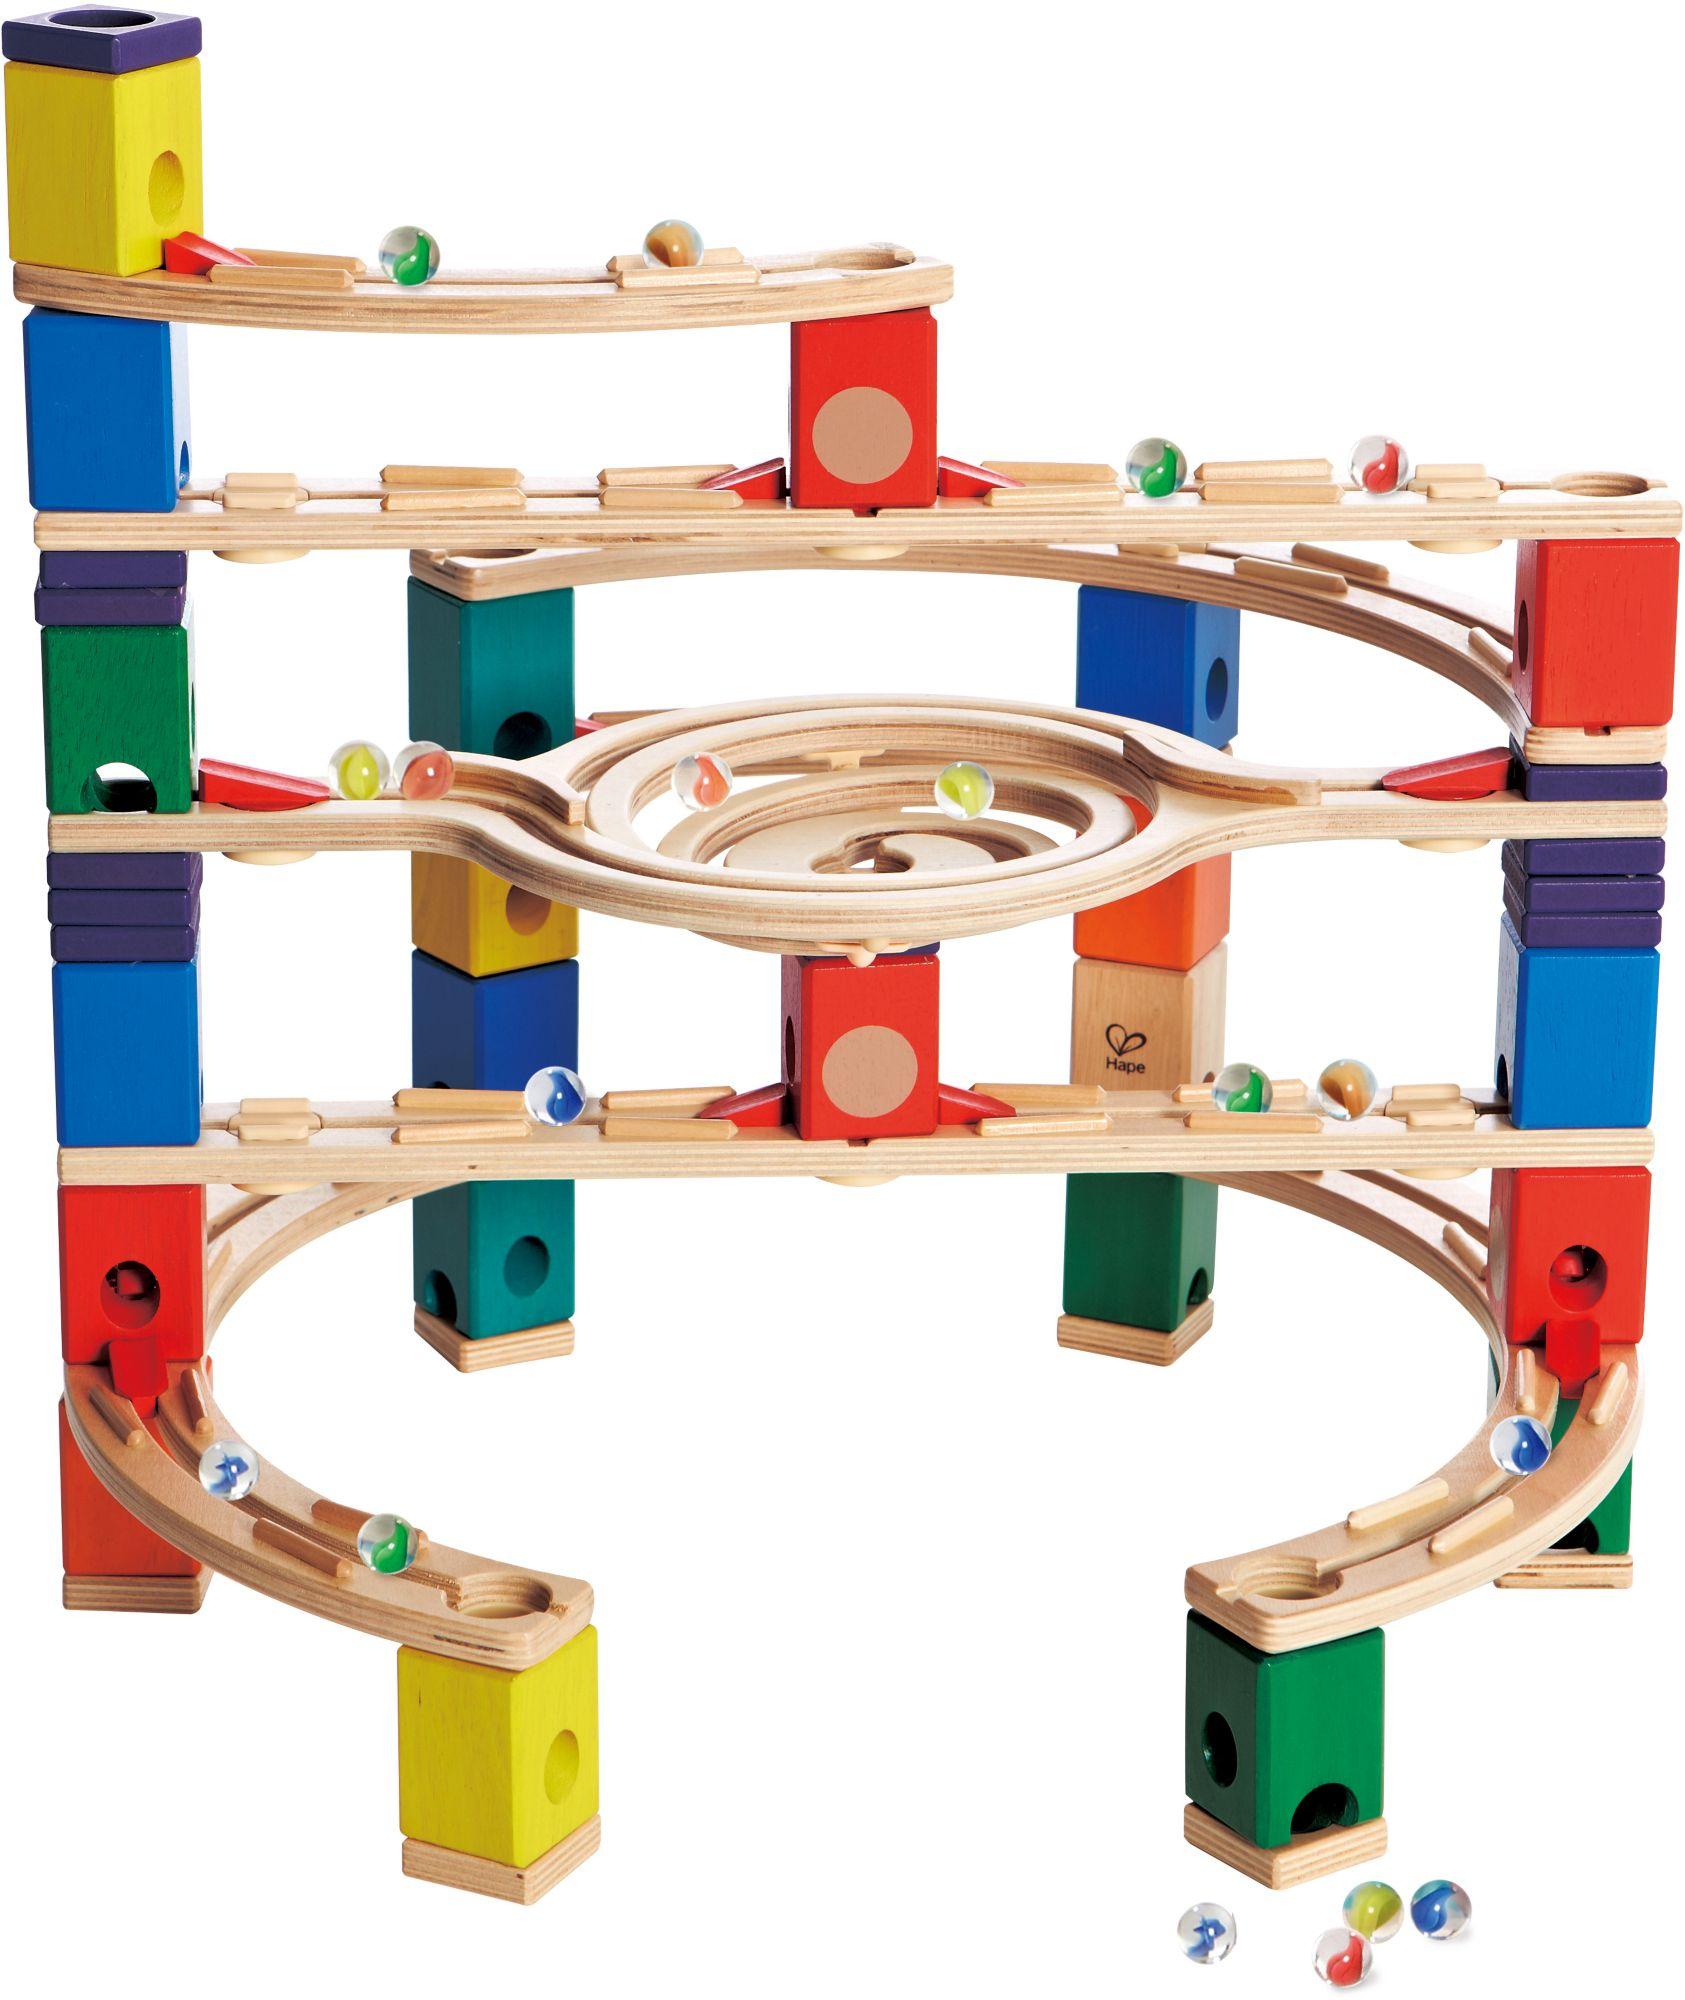 HAPE Hape Kugelbahn aus Holz, »Quadrilla Loop de Loop«